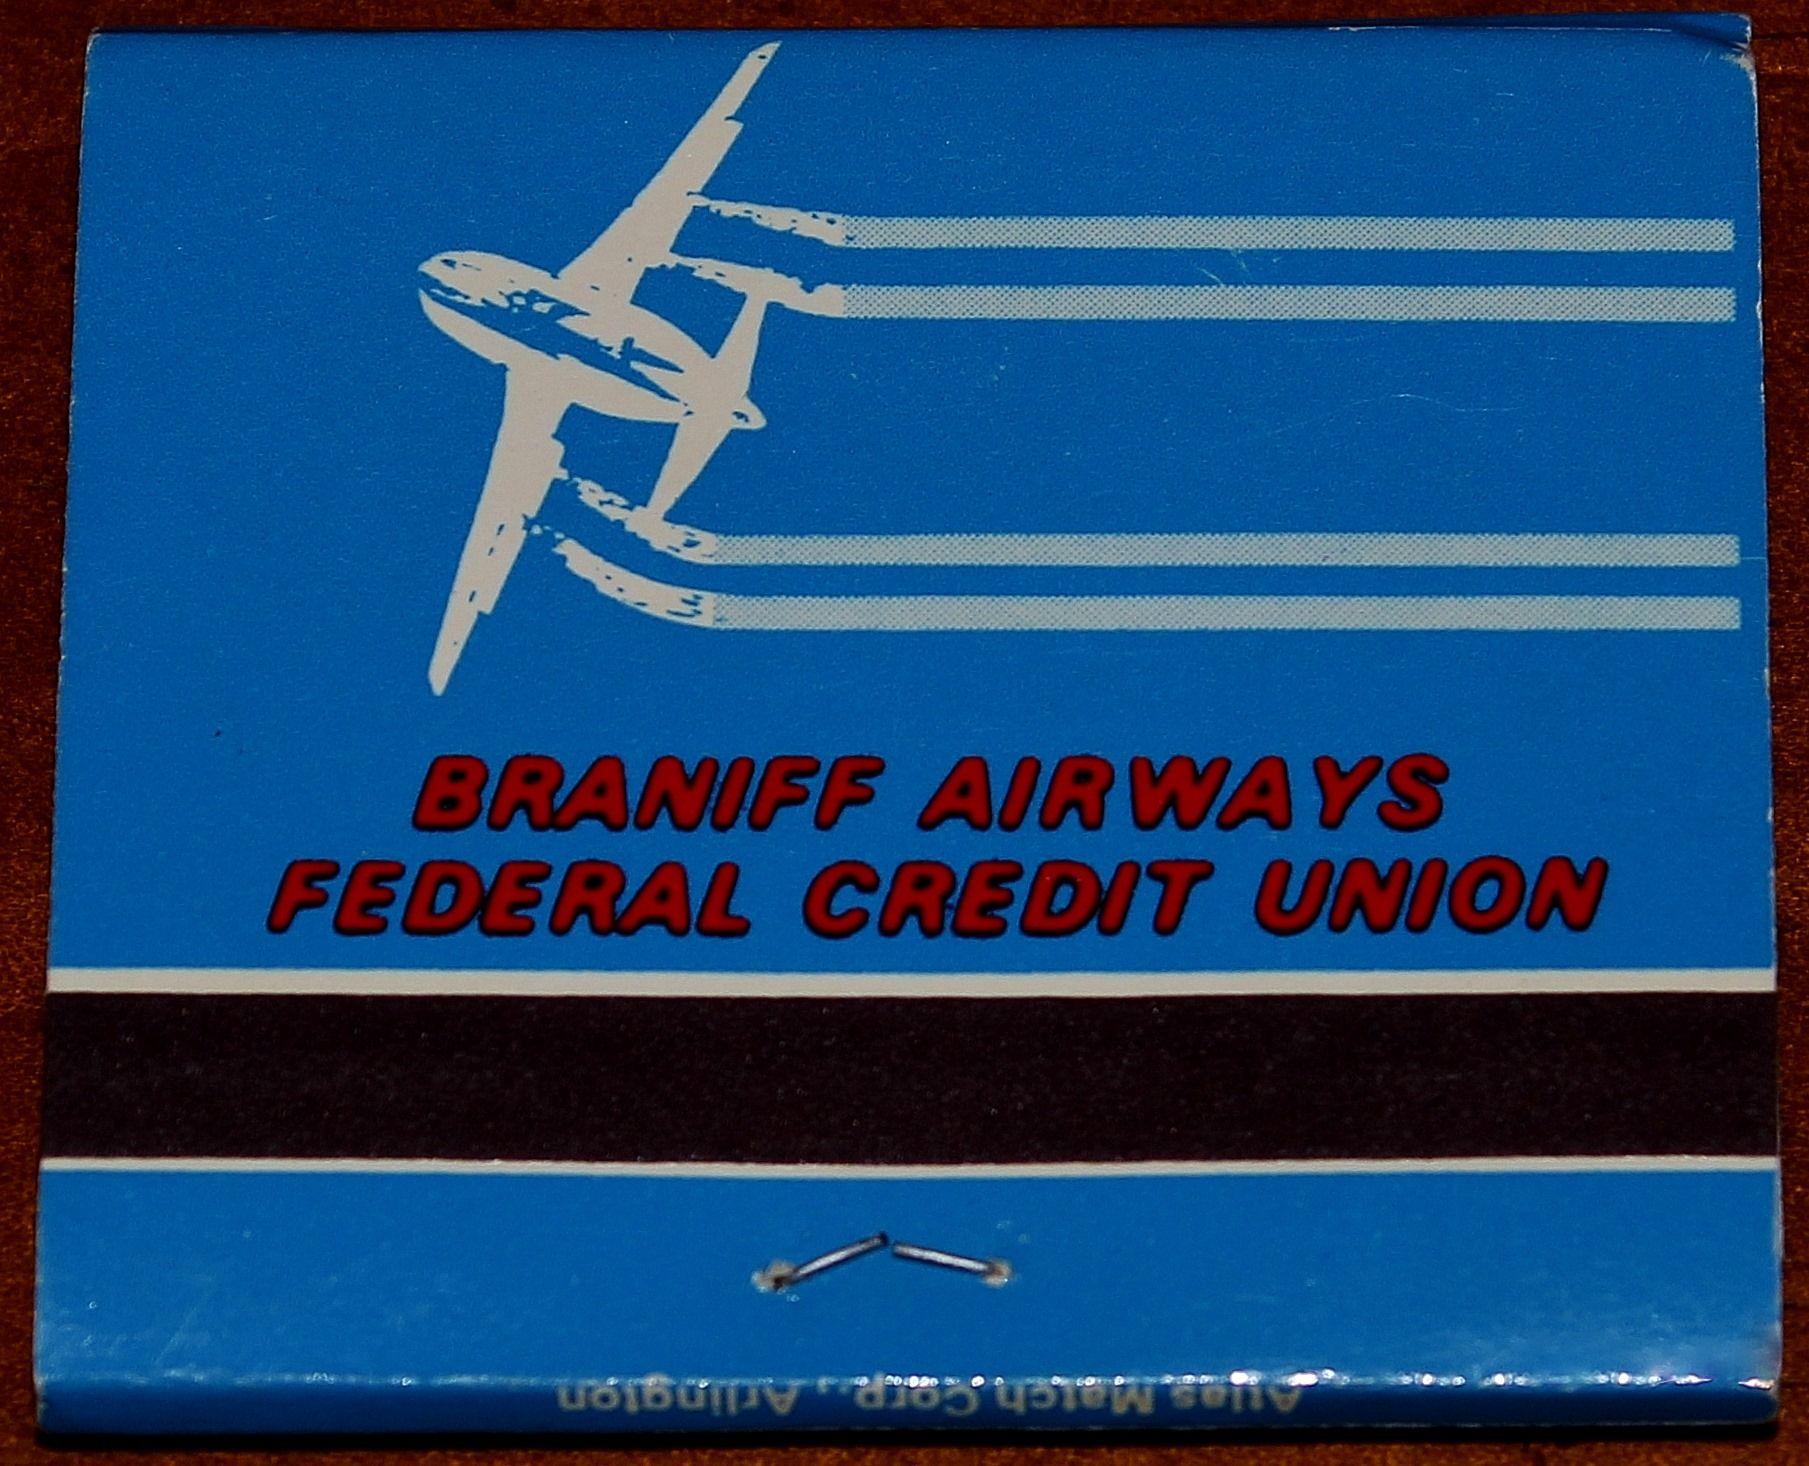 Braniff Airways Federal Credit Union R. Chrismon